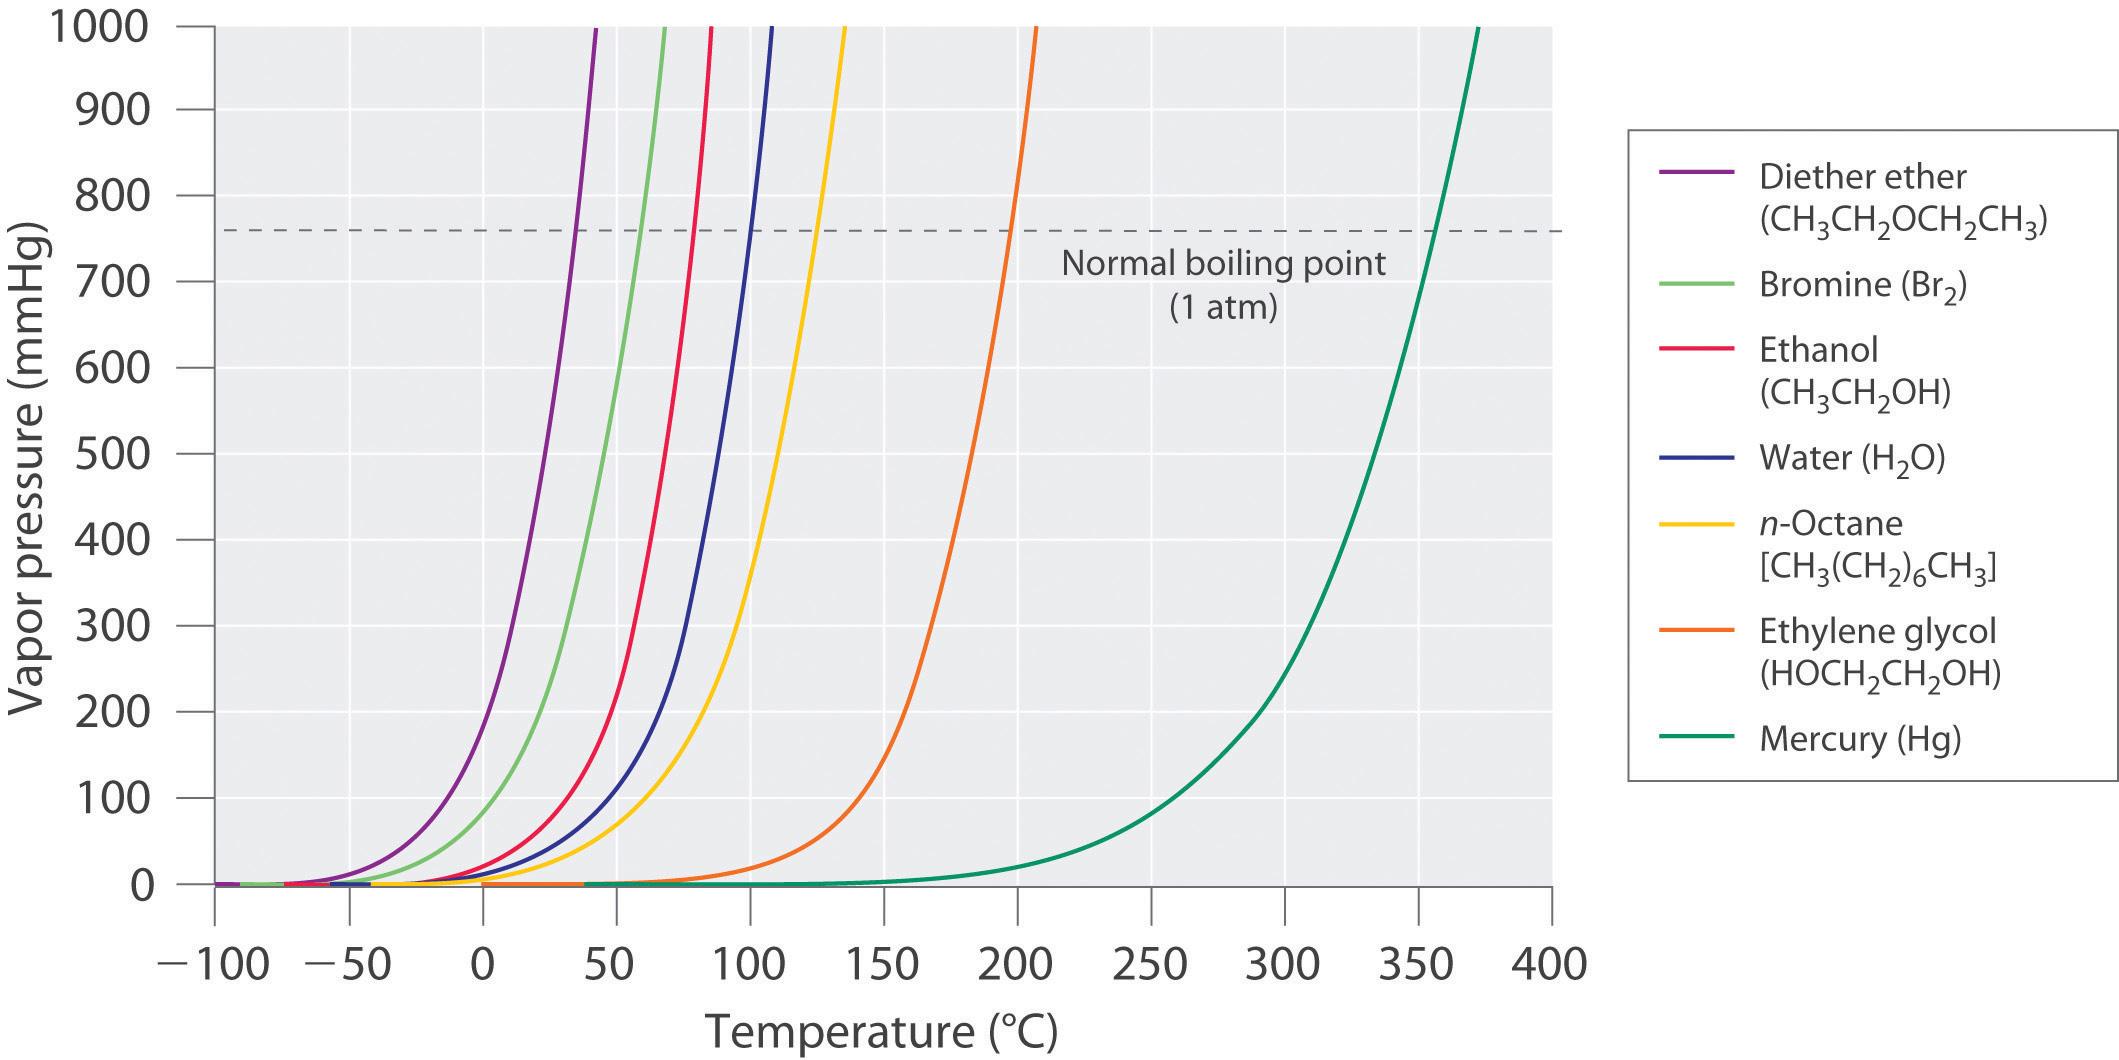 bromine phase diagram [ 2119 x 1060 Pixel ]